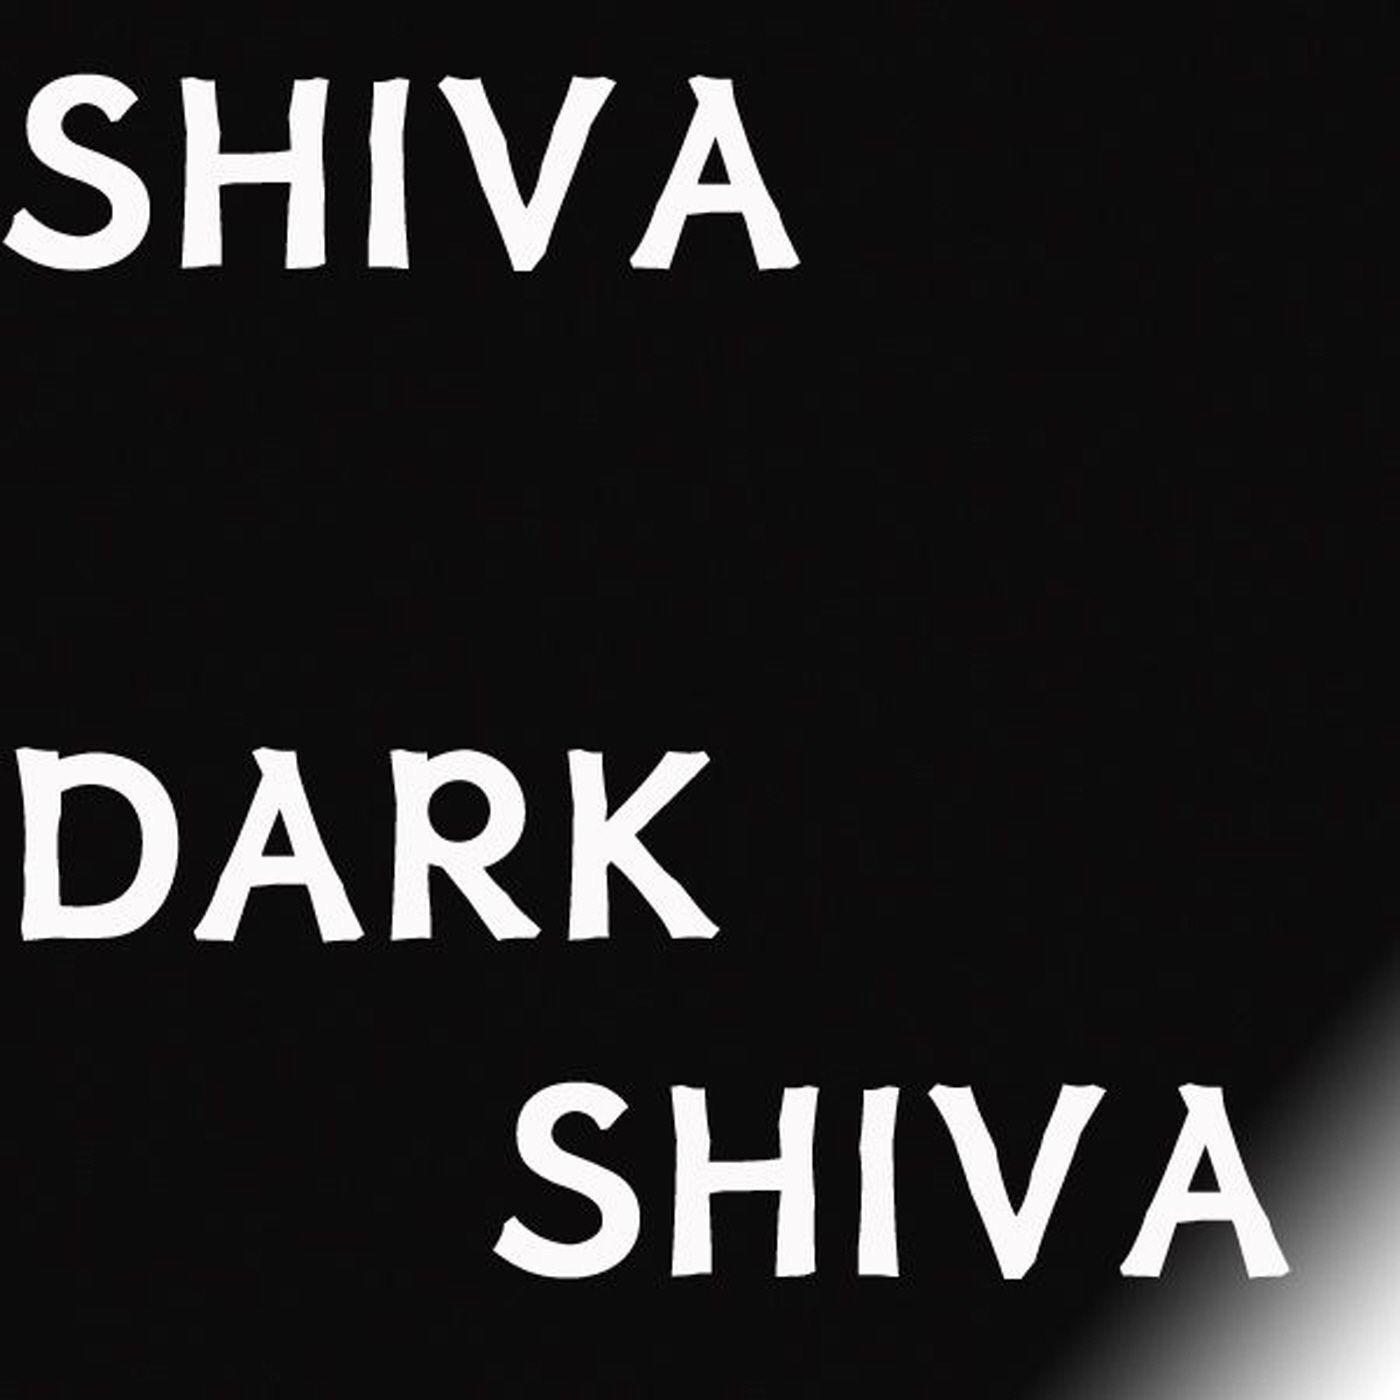 Darkshiva - Single